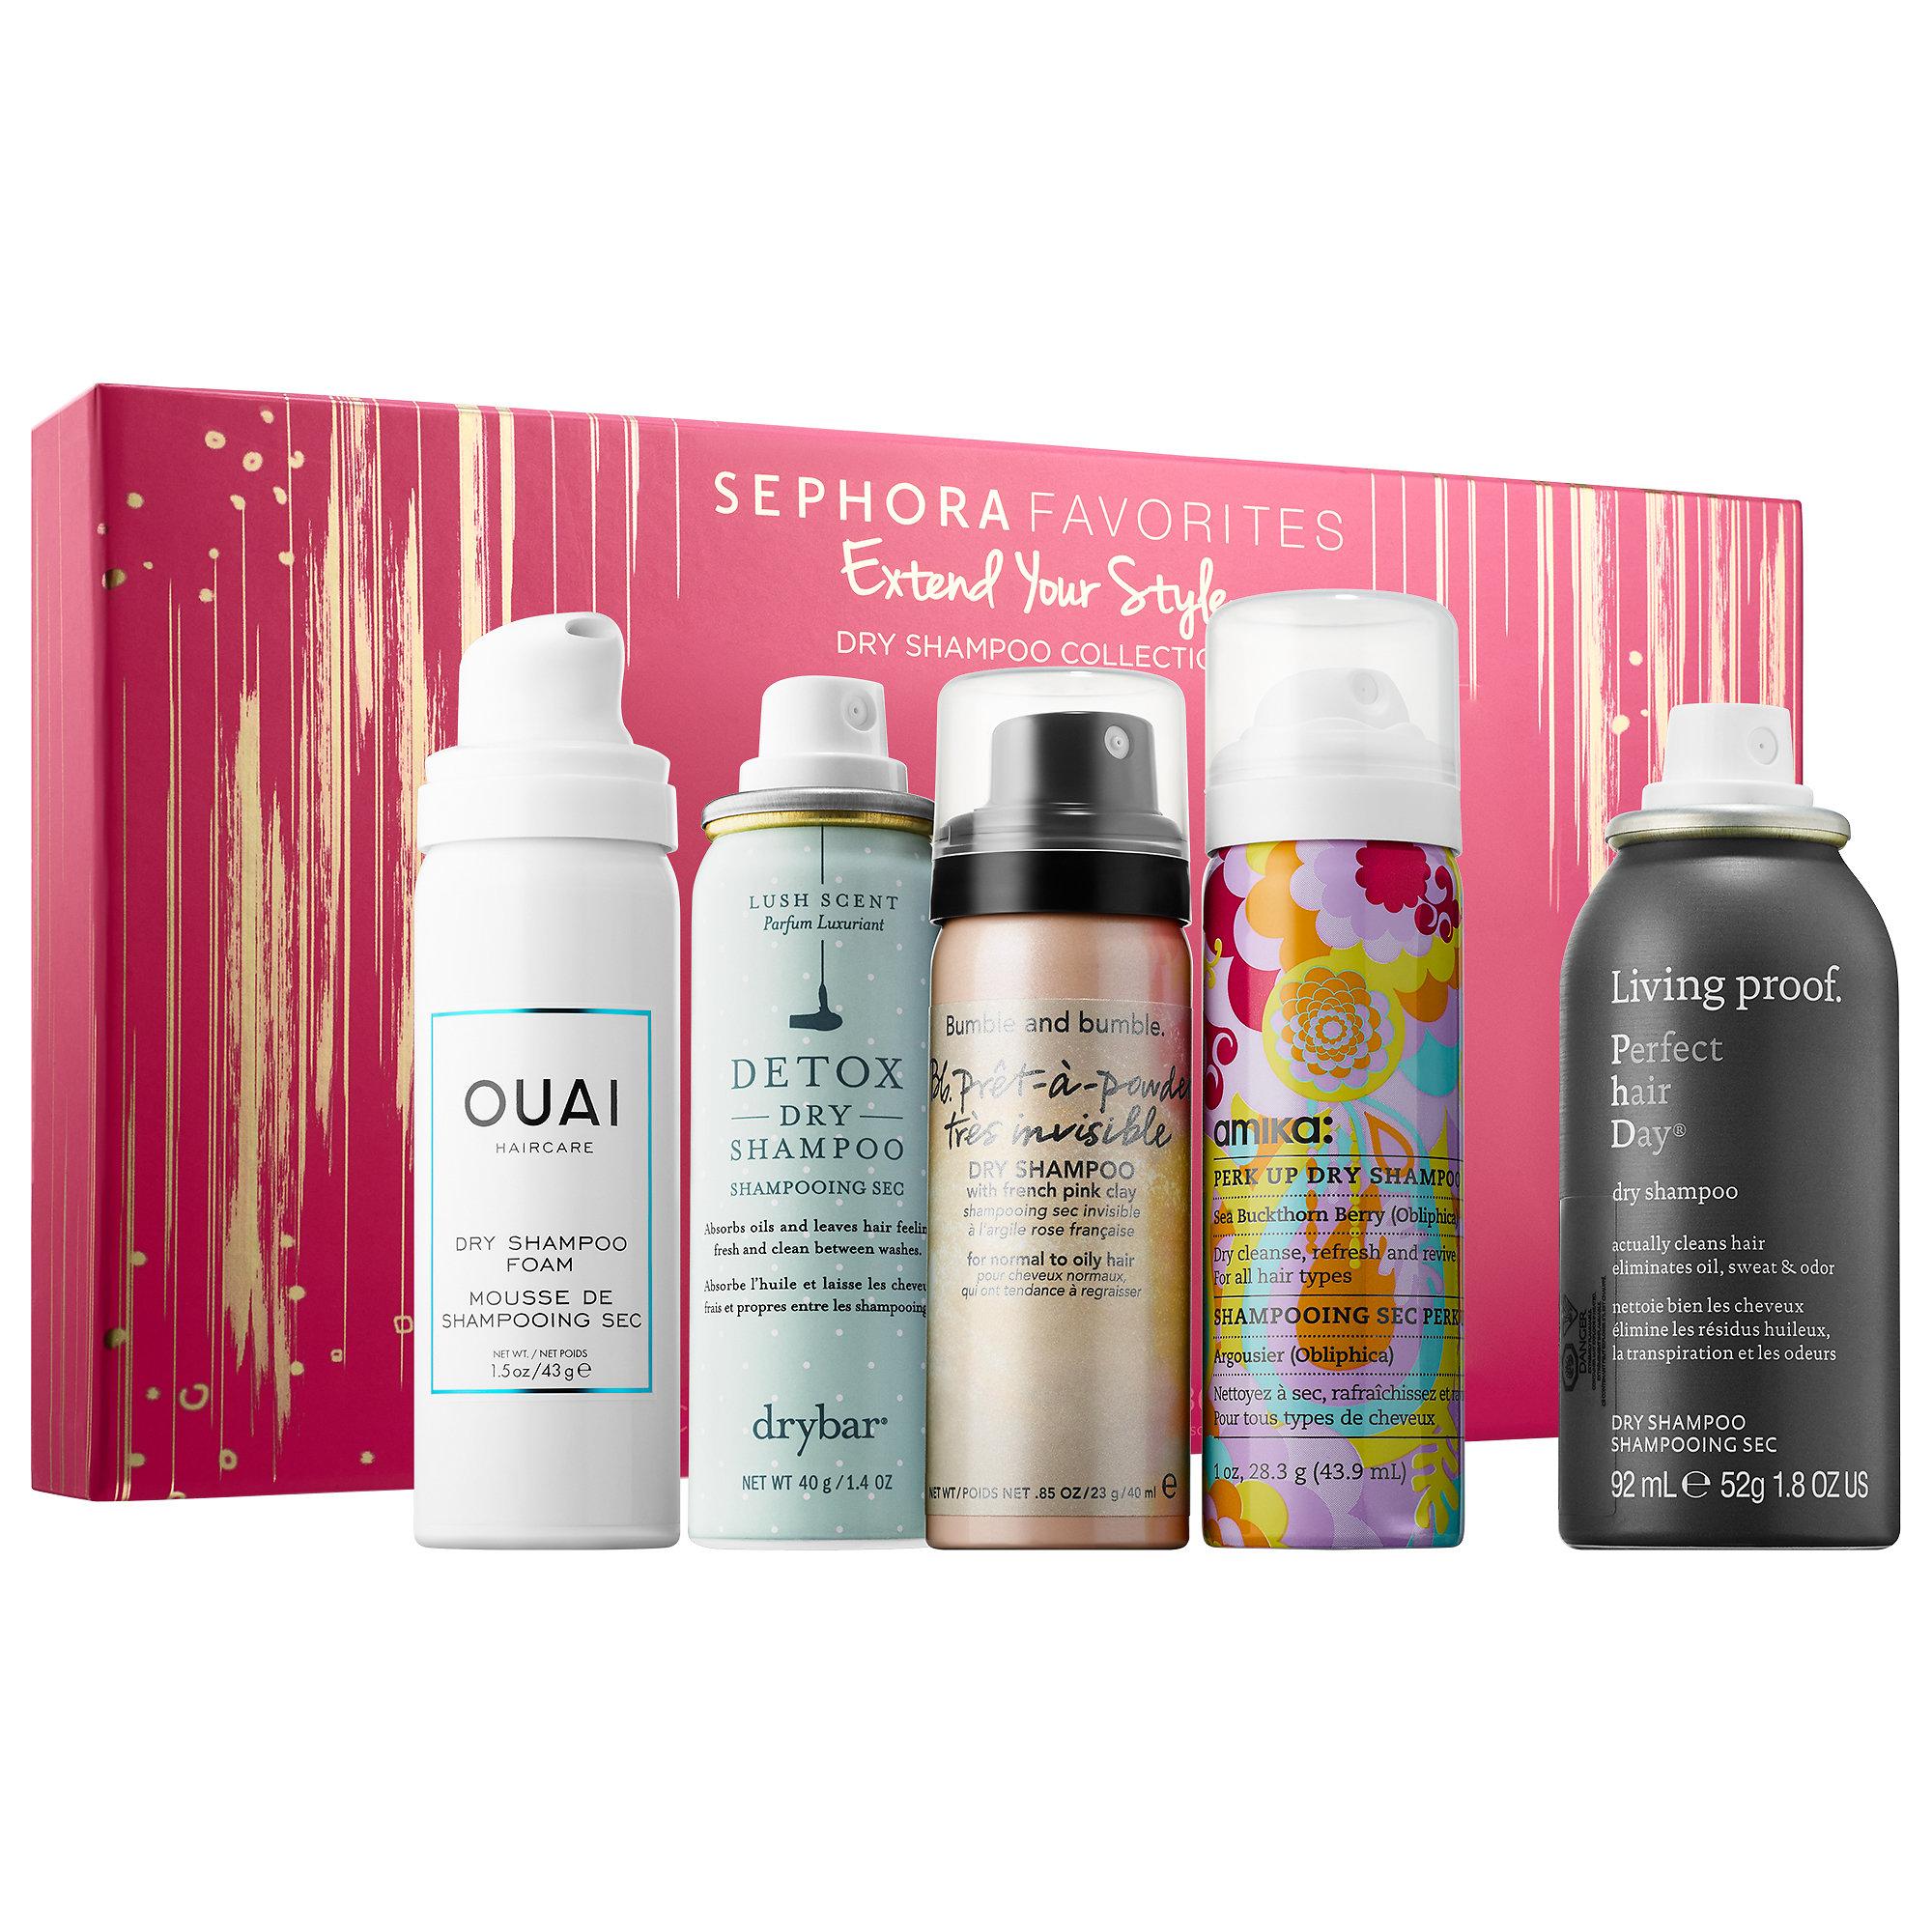 Dry Shampoo Gift Set